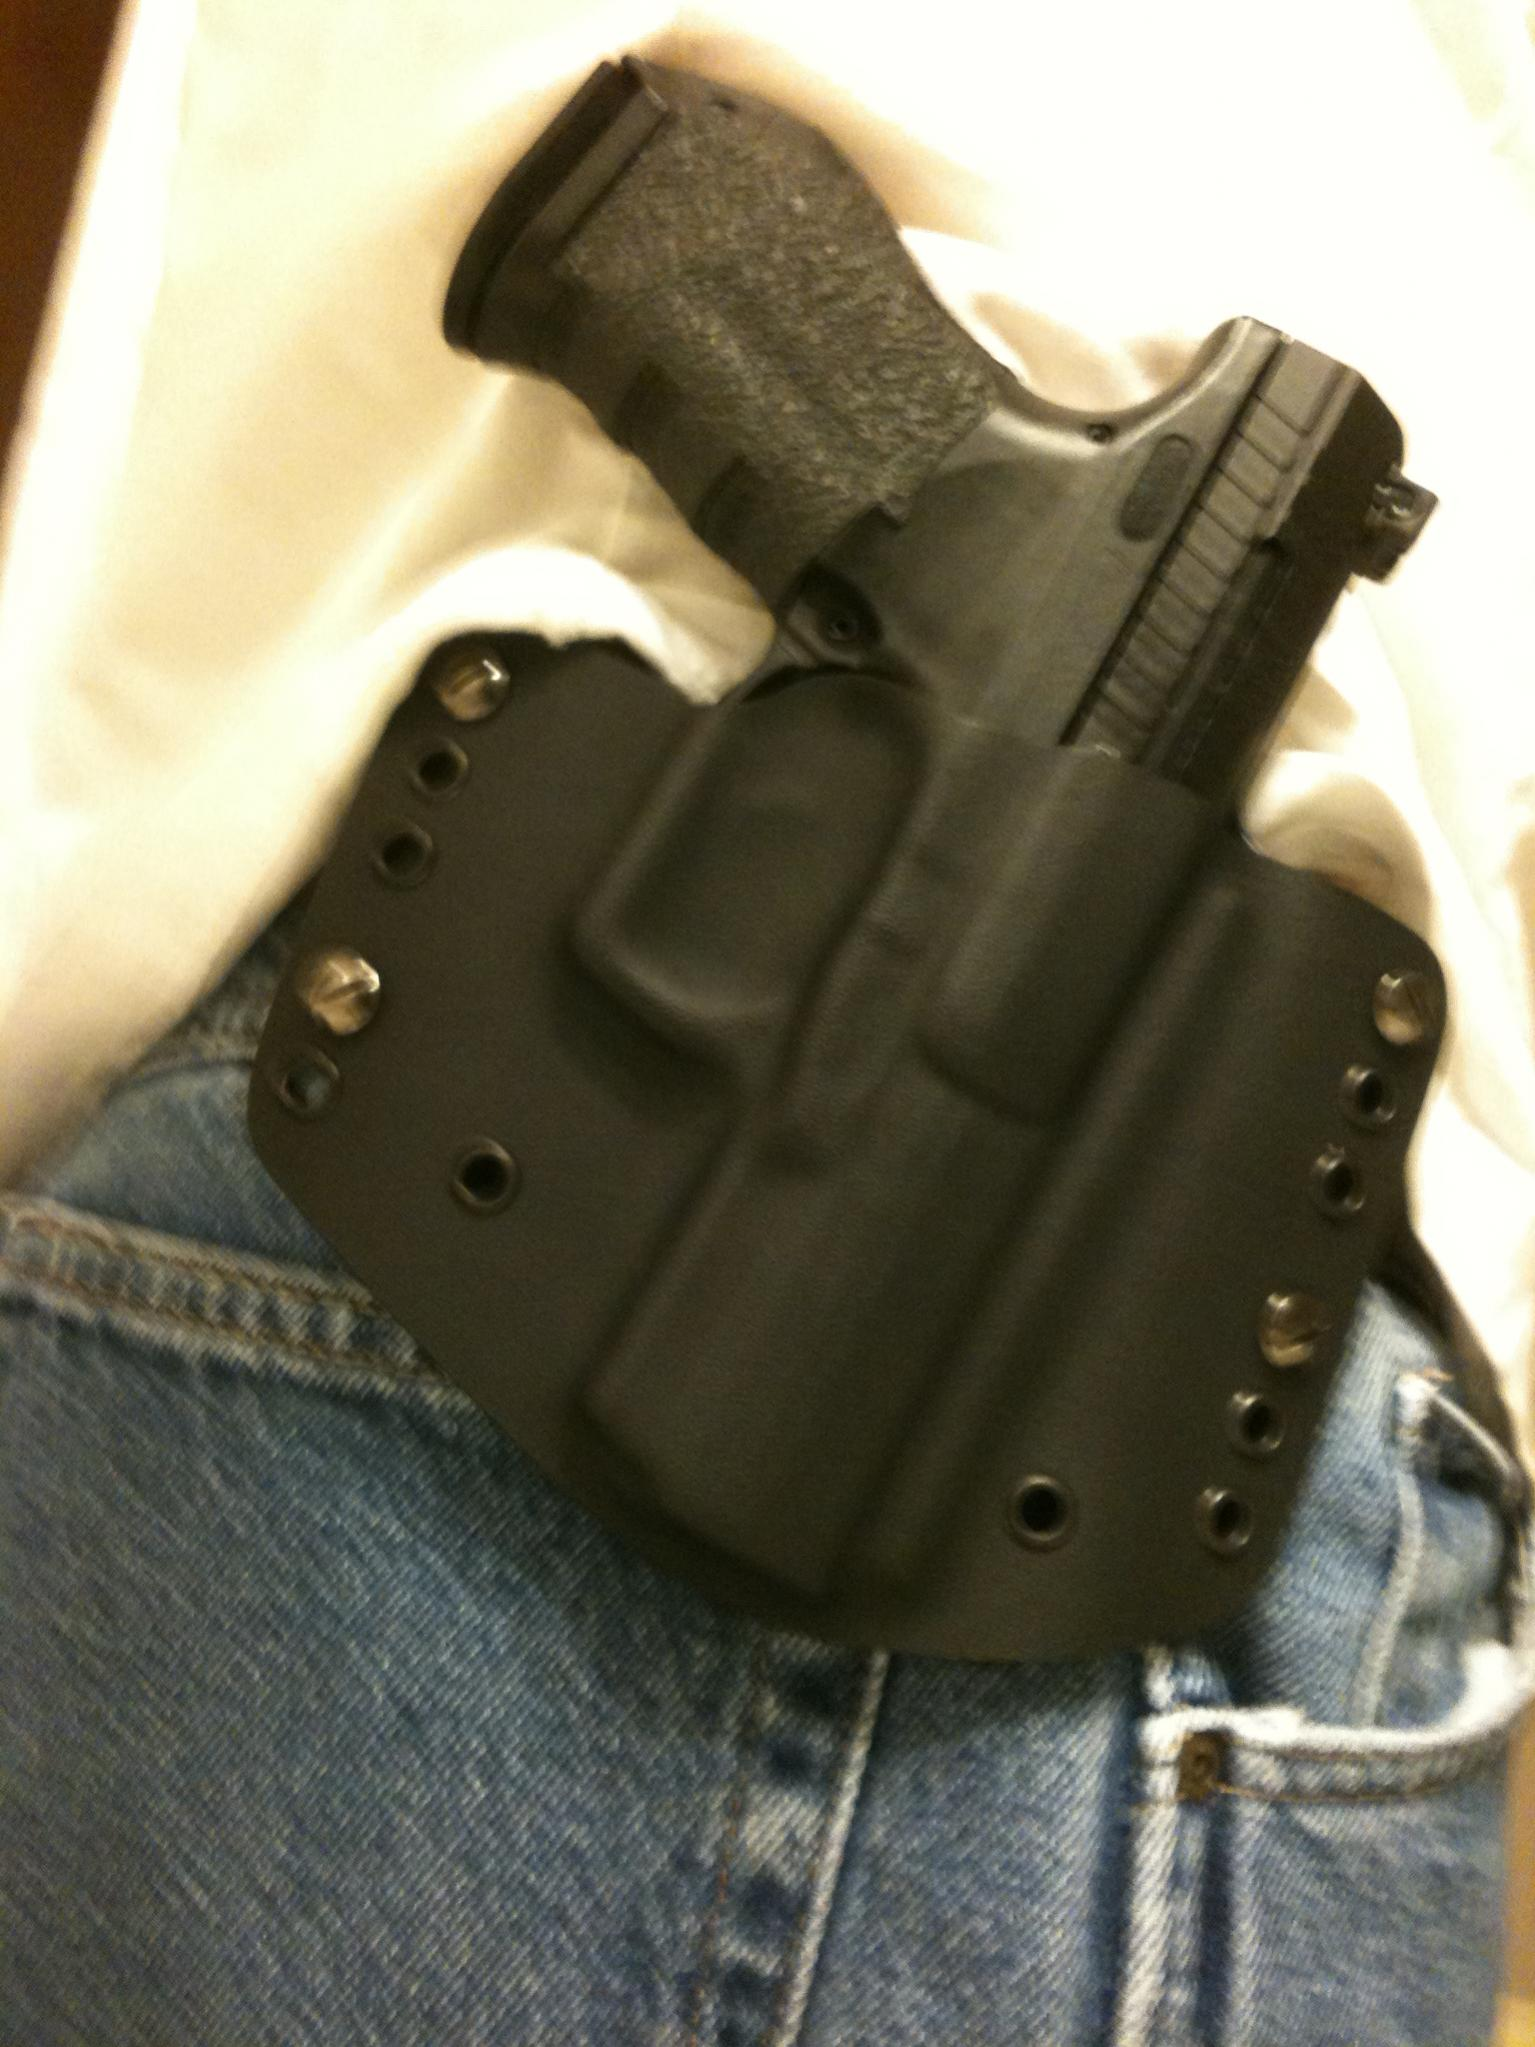 Midworld gun leather is GTG,,,,,kydex too....-new-holster2.jpg